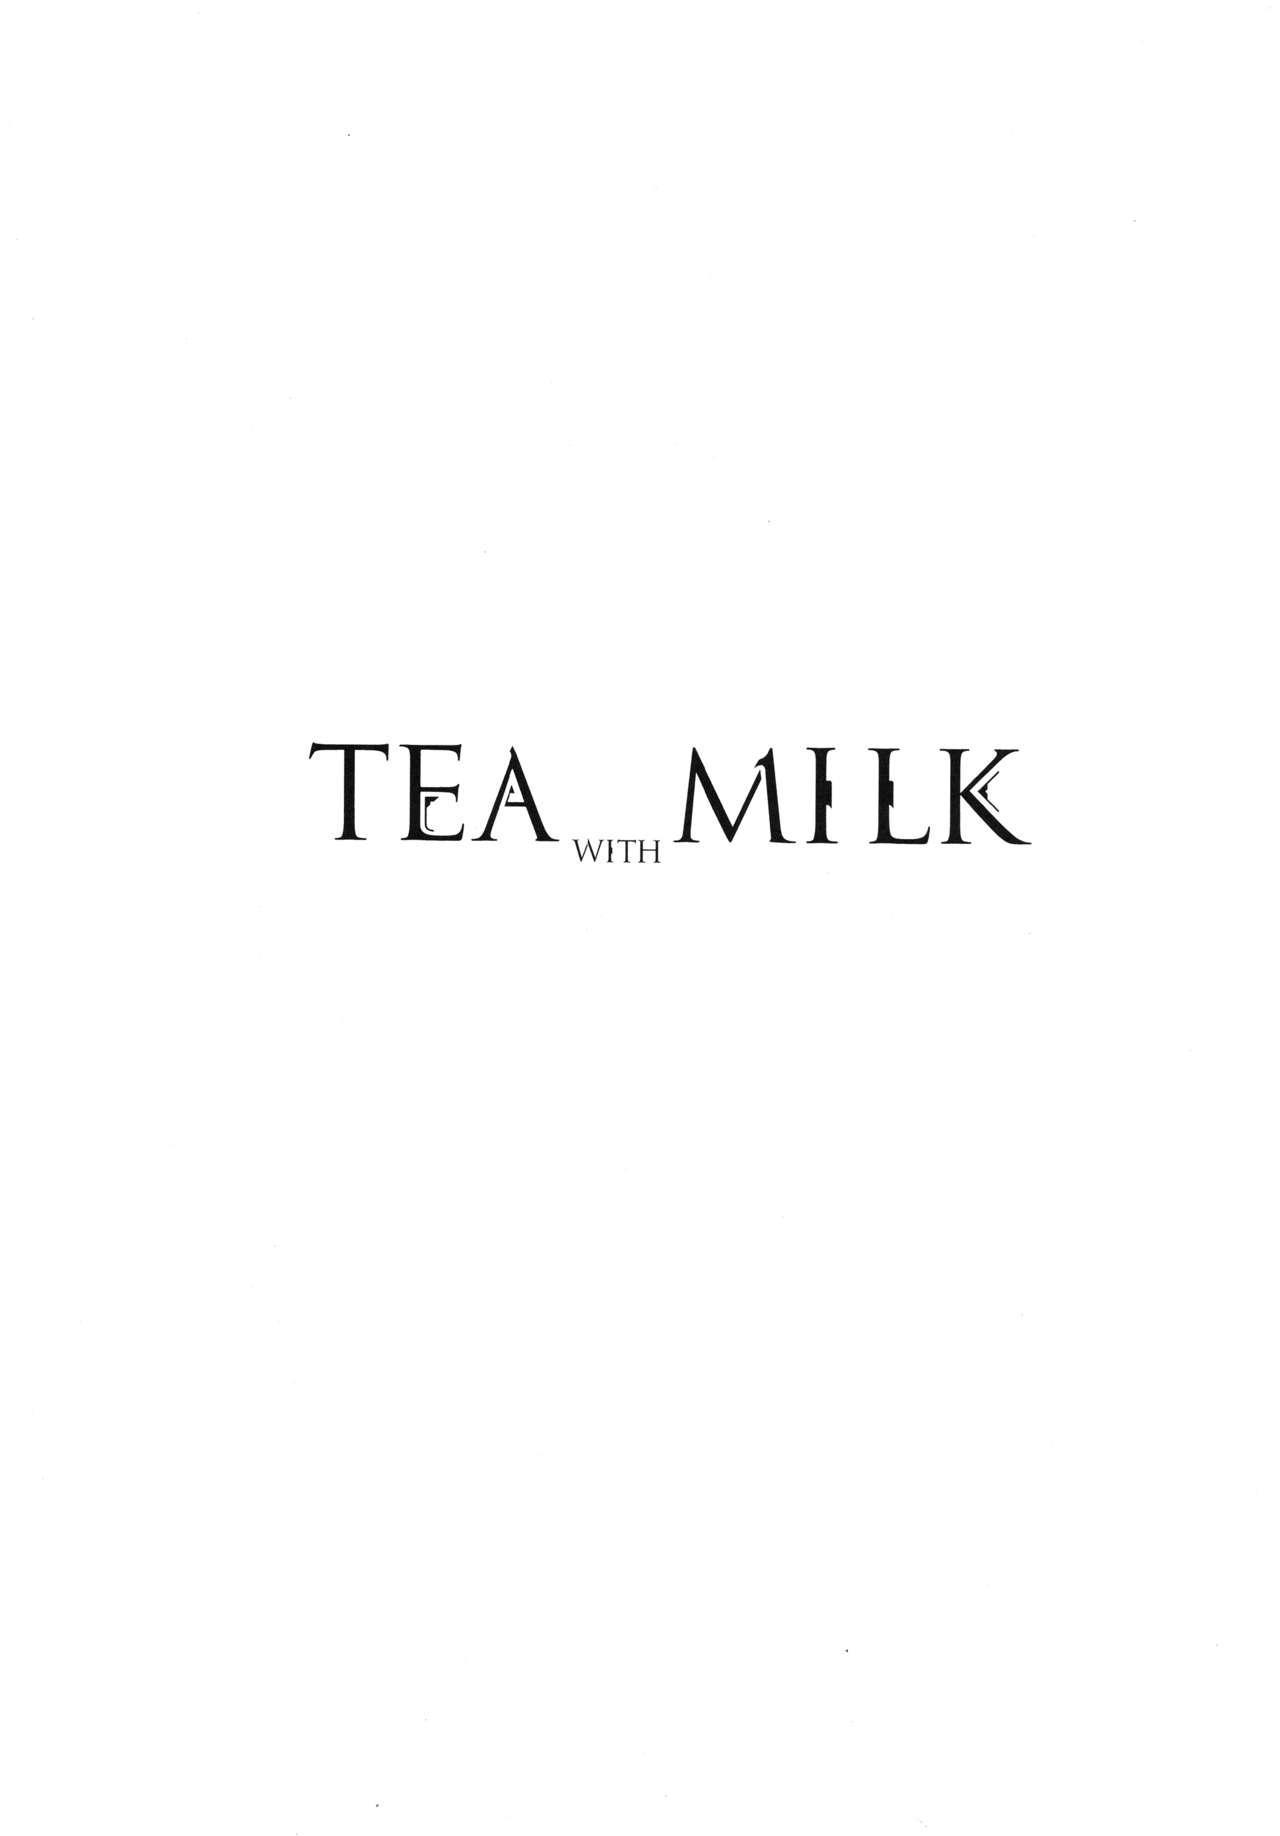 TEA WITH MILK 3